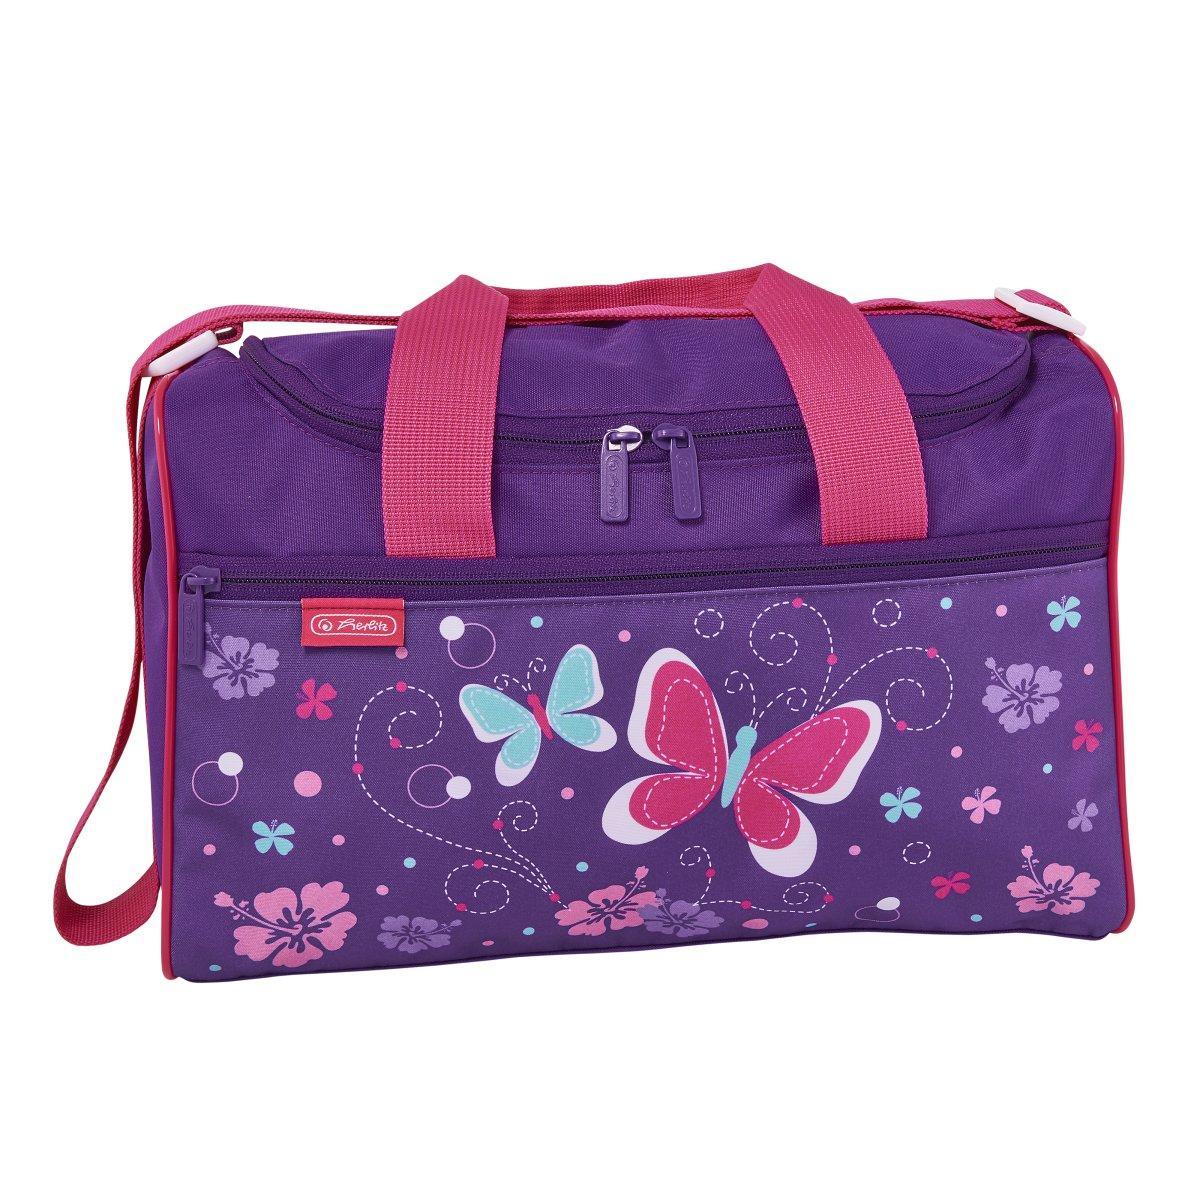 Сумка спортивная Herlitz Sportbag XL Butterfly Бабочки (50021864)